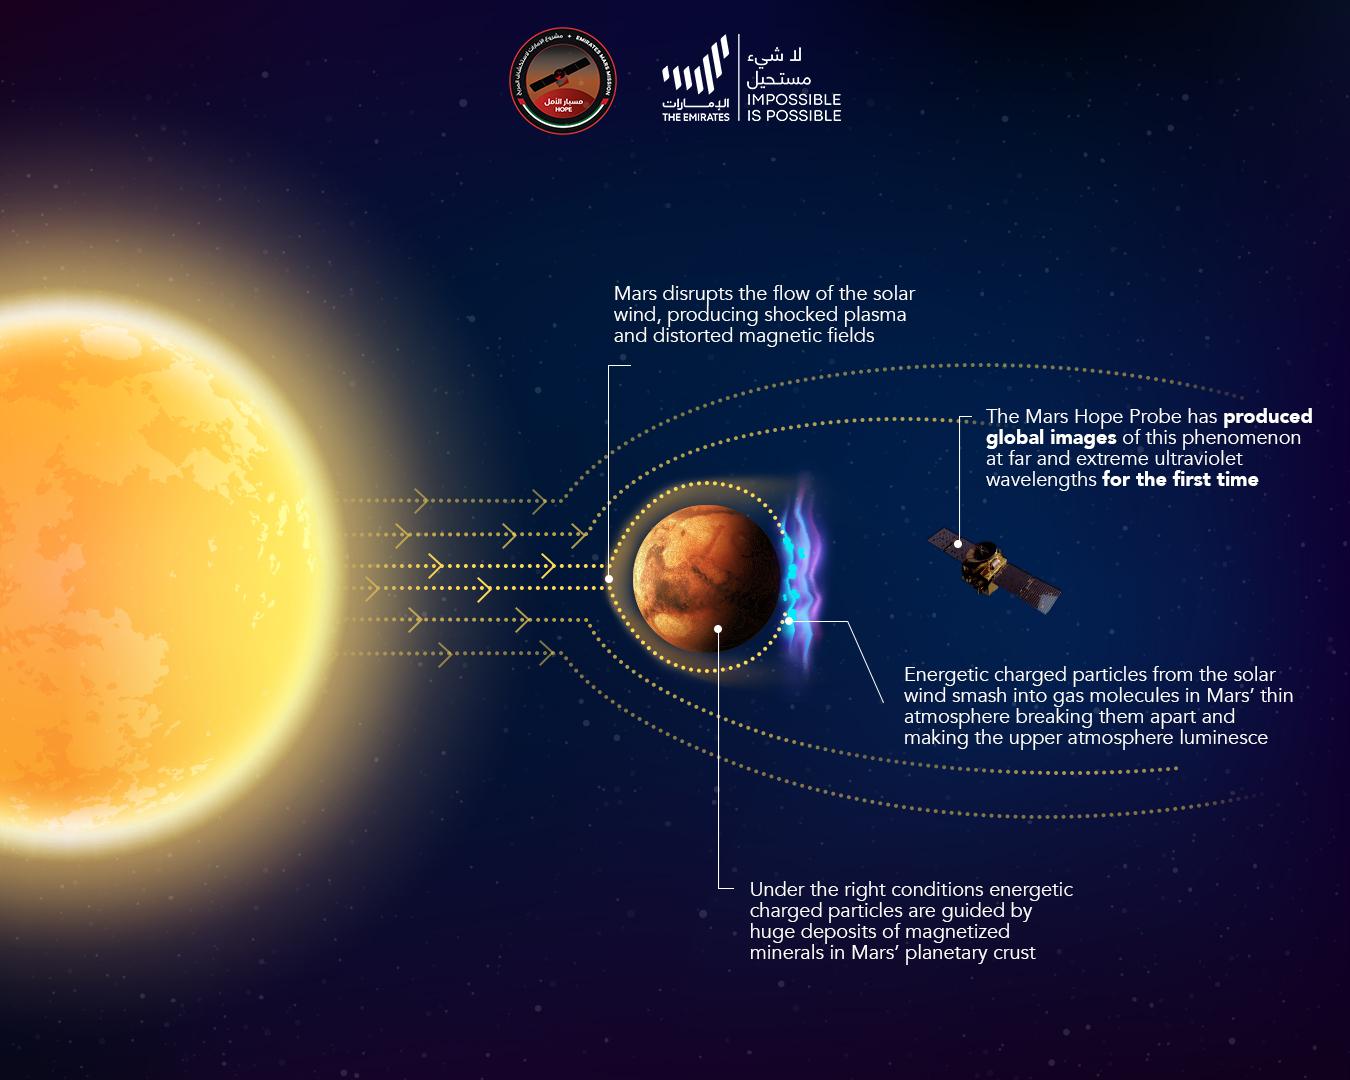 The Emirates mission captured new global images of Mars' discrete aurora